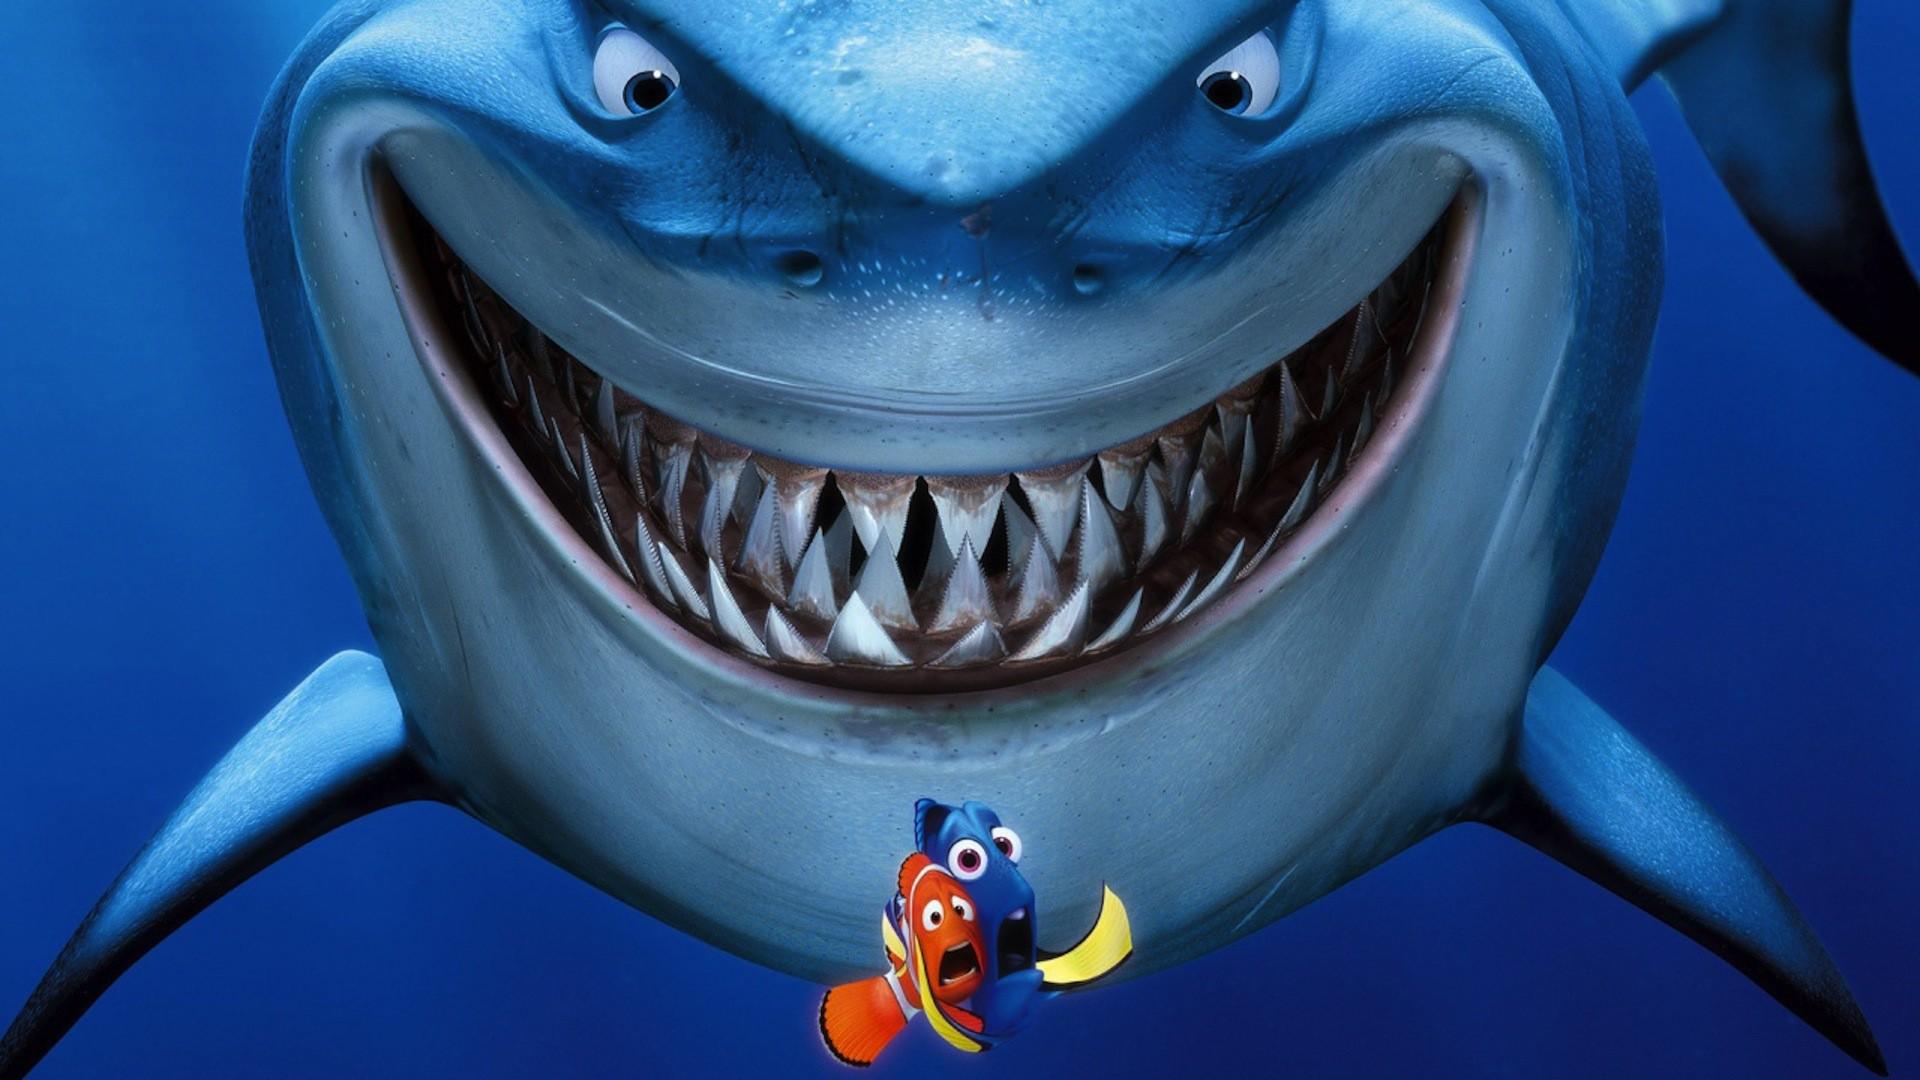 Fish Finding Nemo Fish Wallpapers Hd Desktop Download Pc 1920x1080